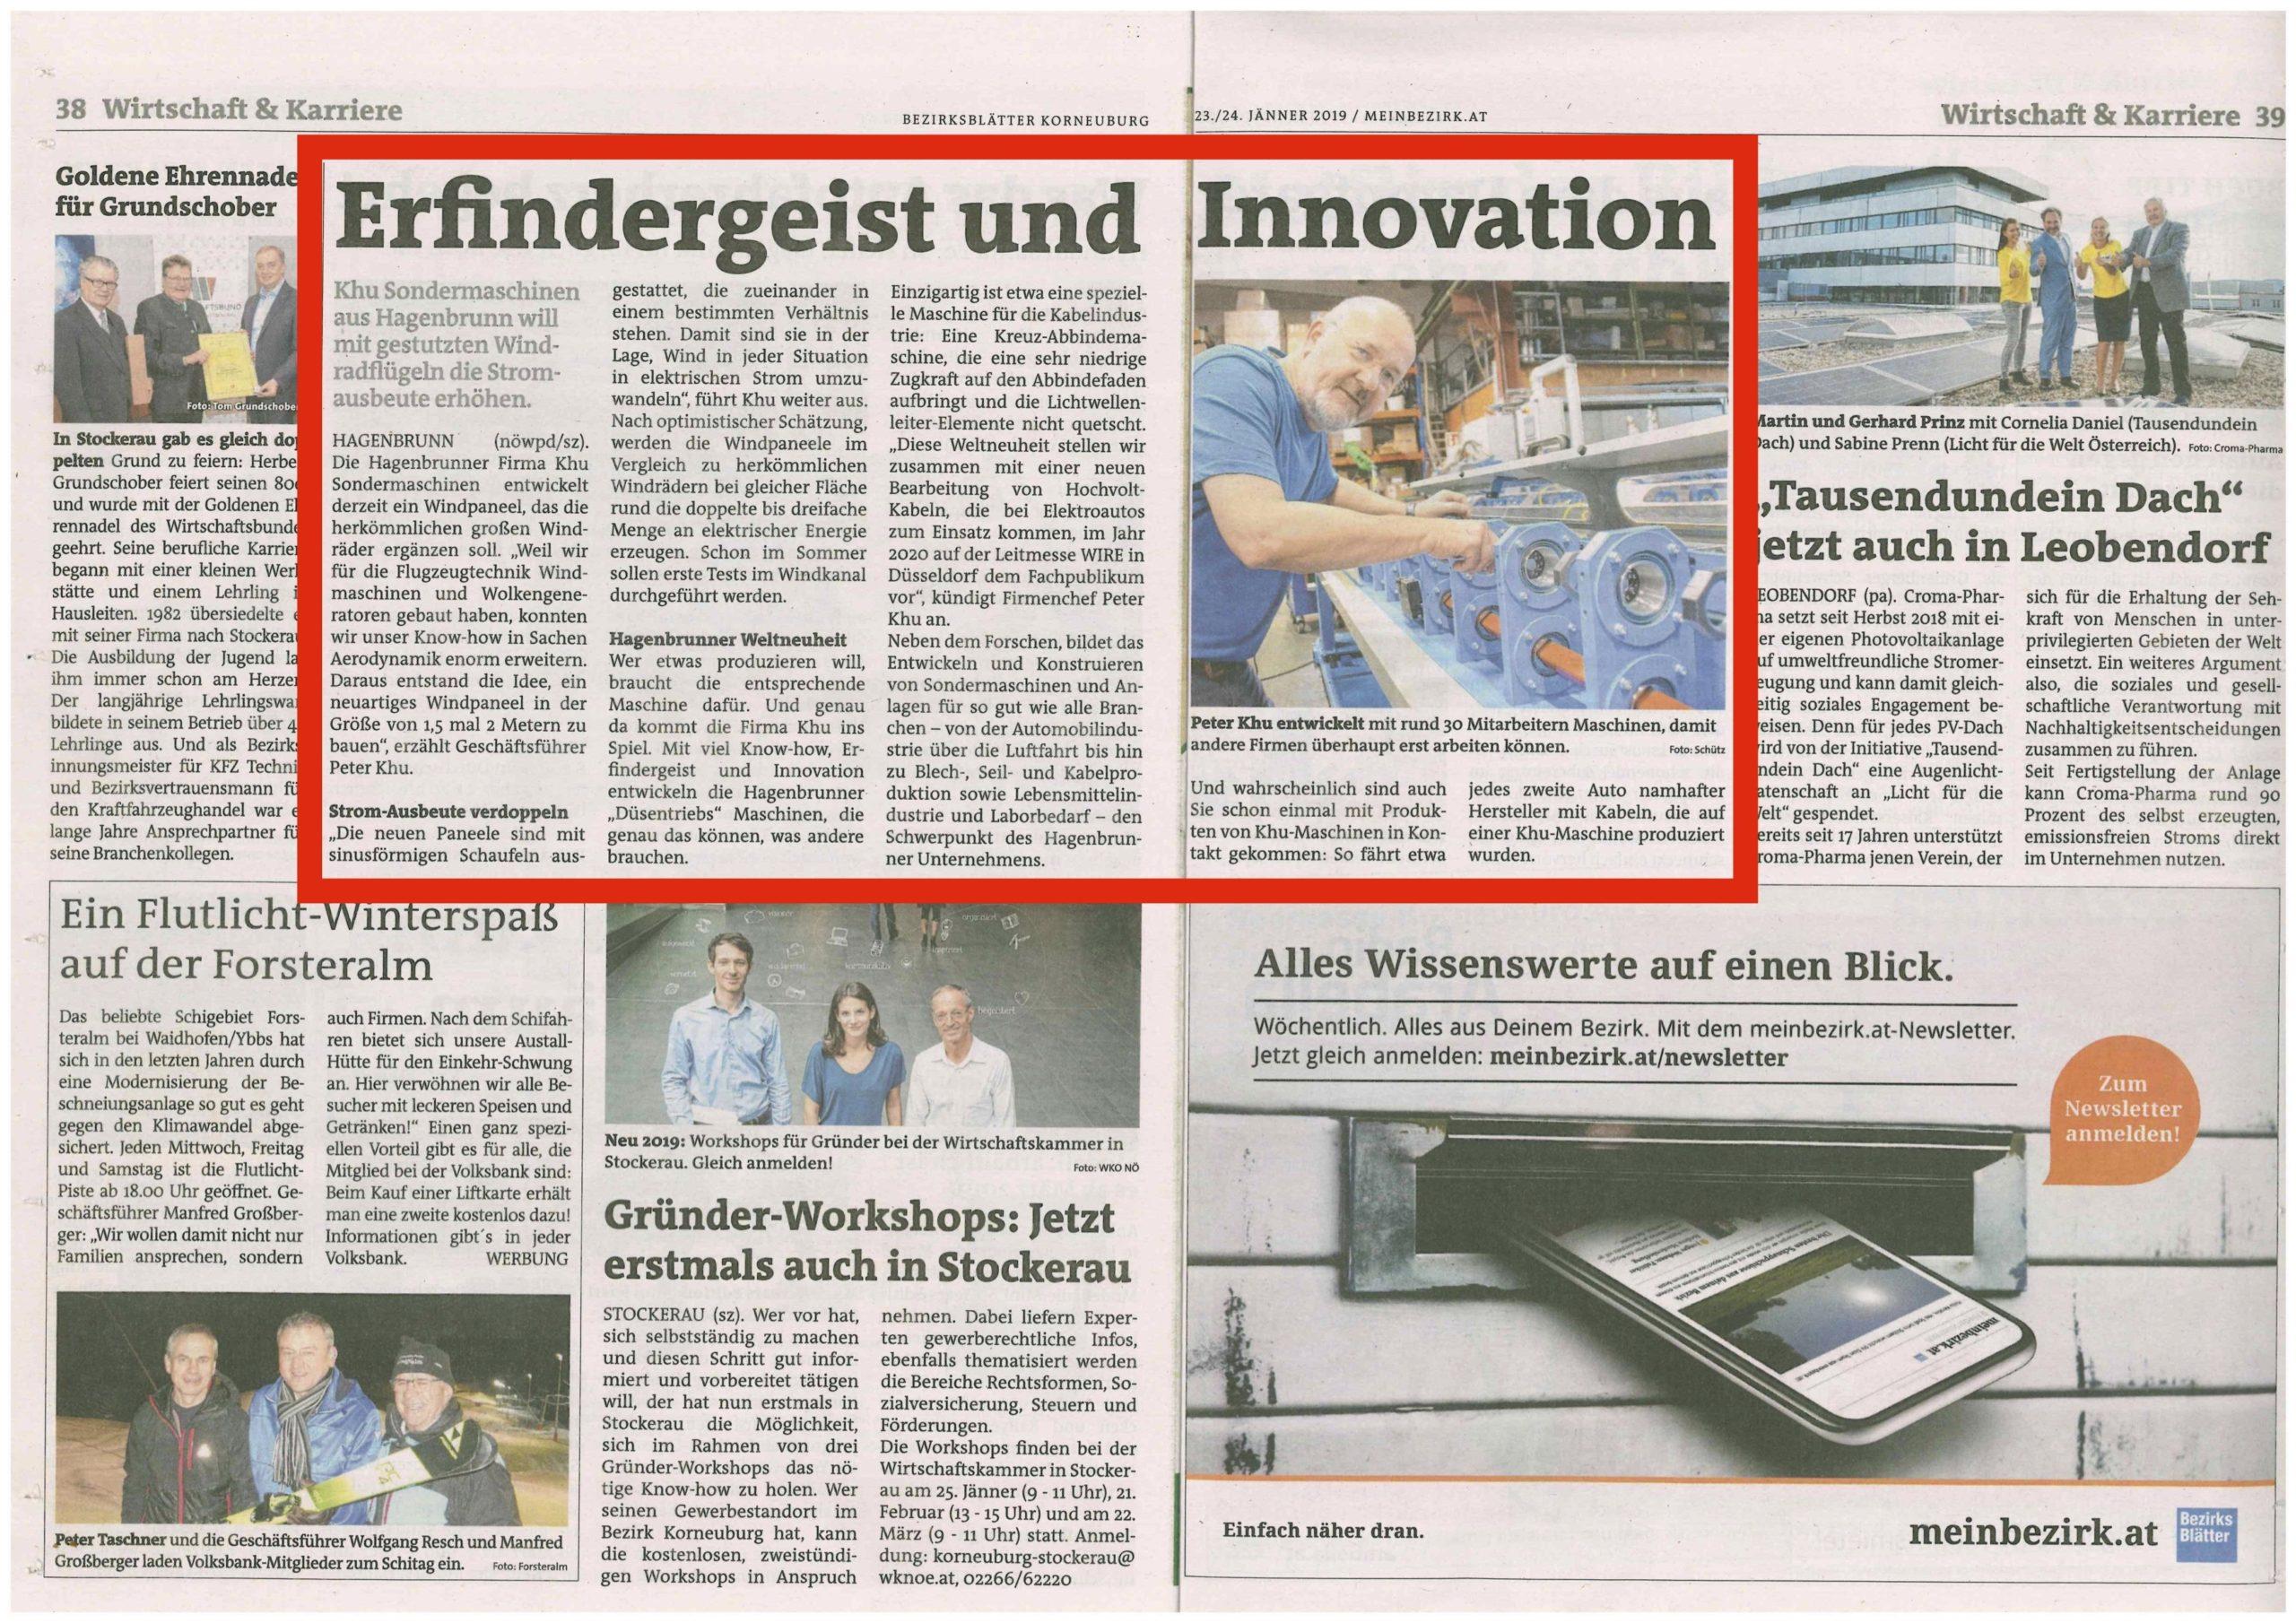 Bezirksblatt Pressemeldung über KHU SZ Technologie